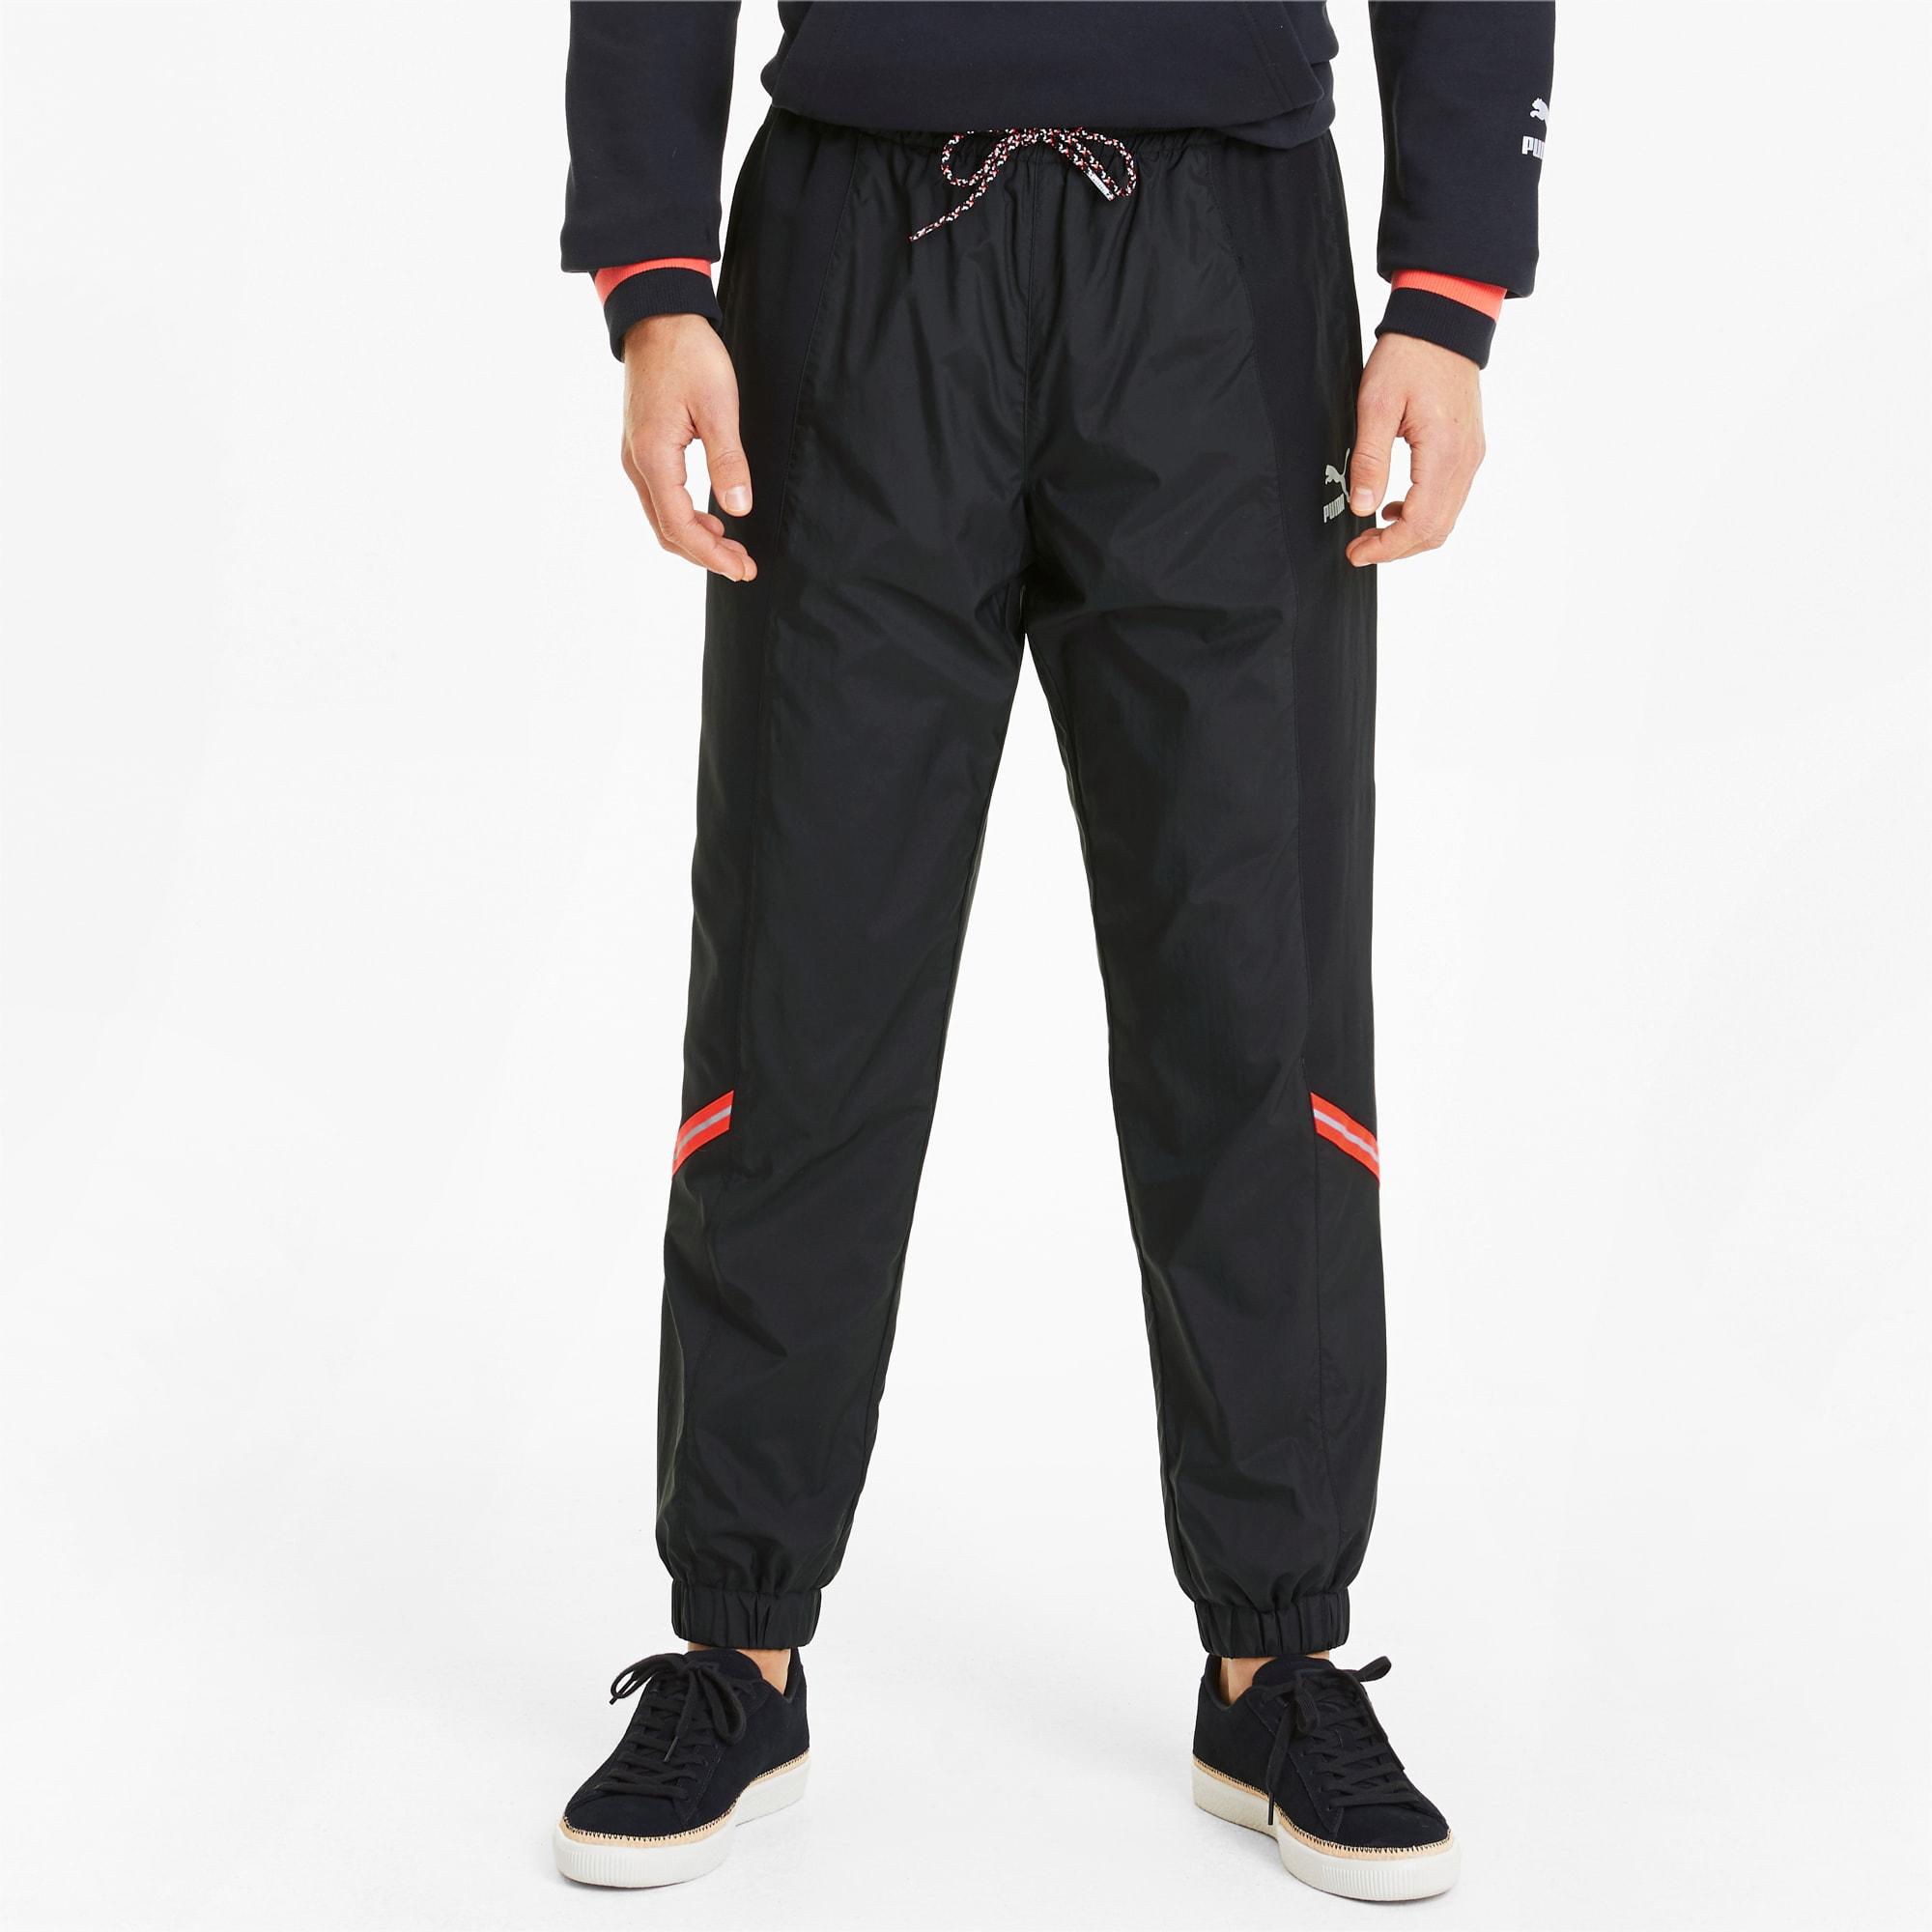 Essentials vestibilit/à regolare Pantaloni sportivi da uomo